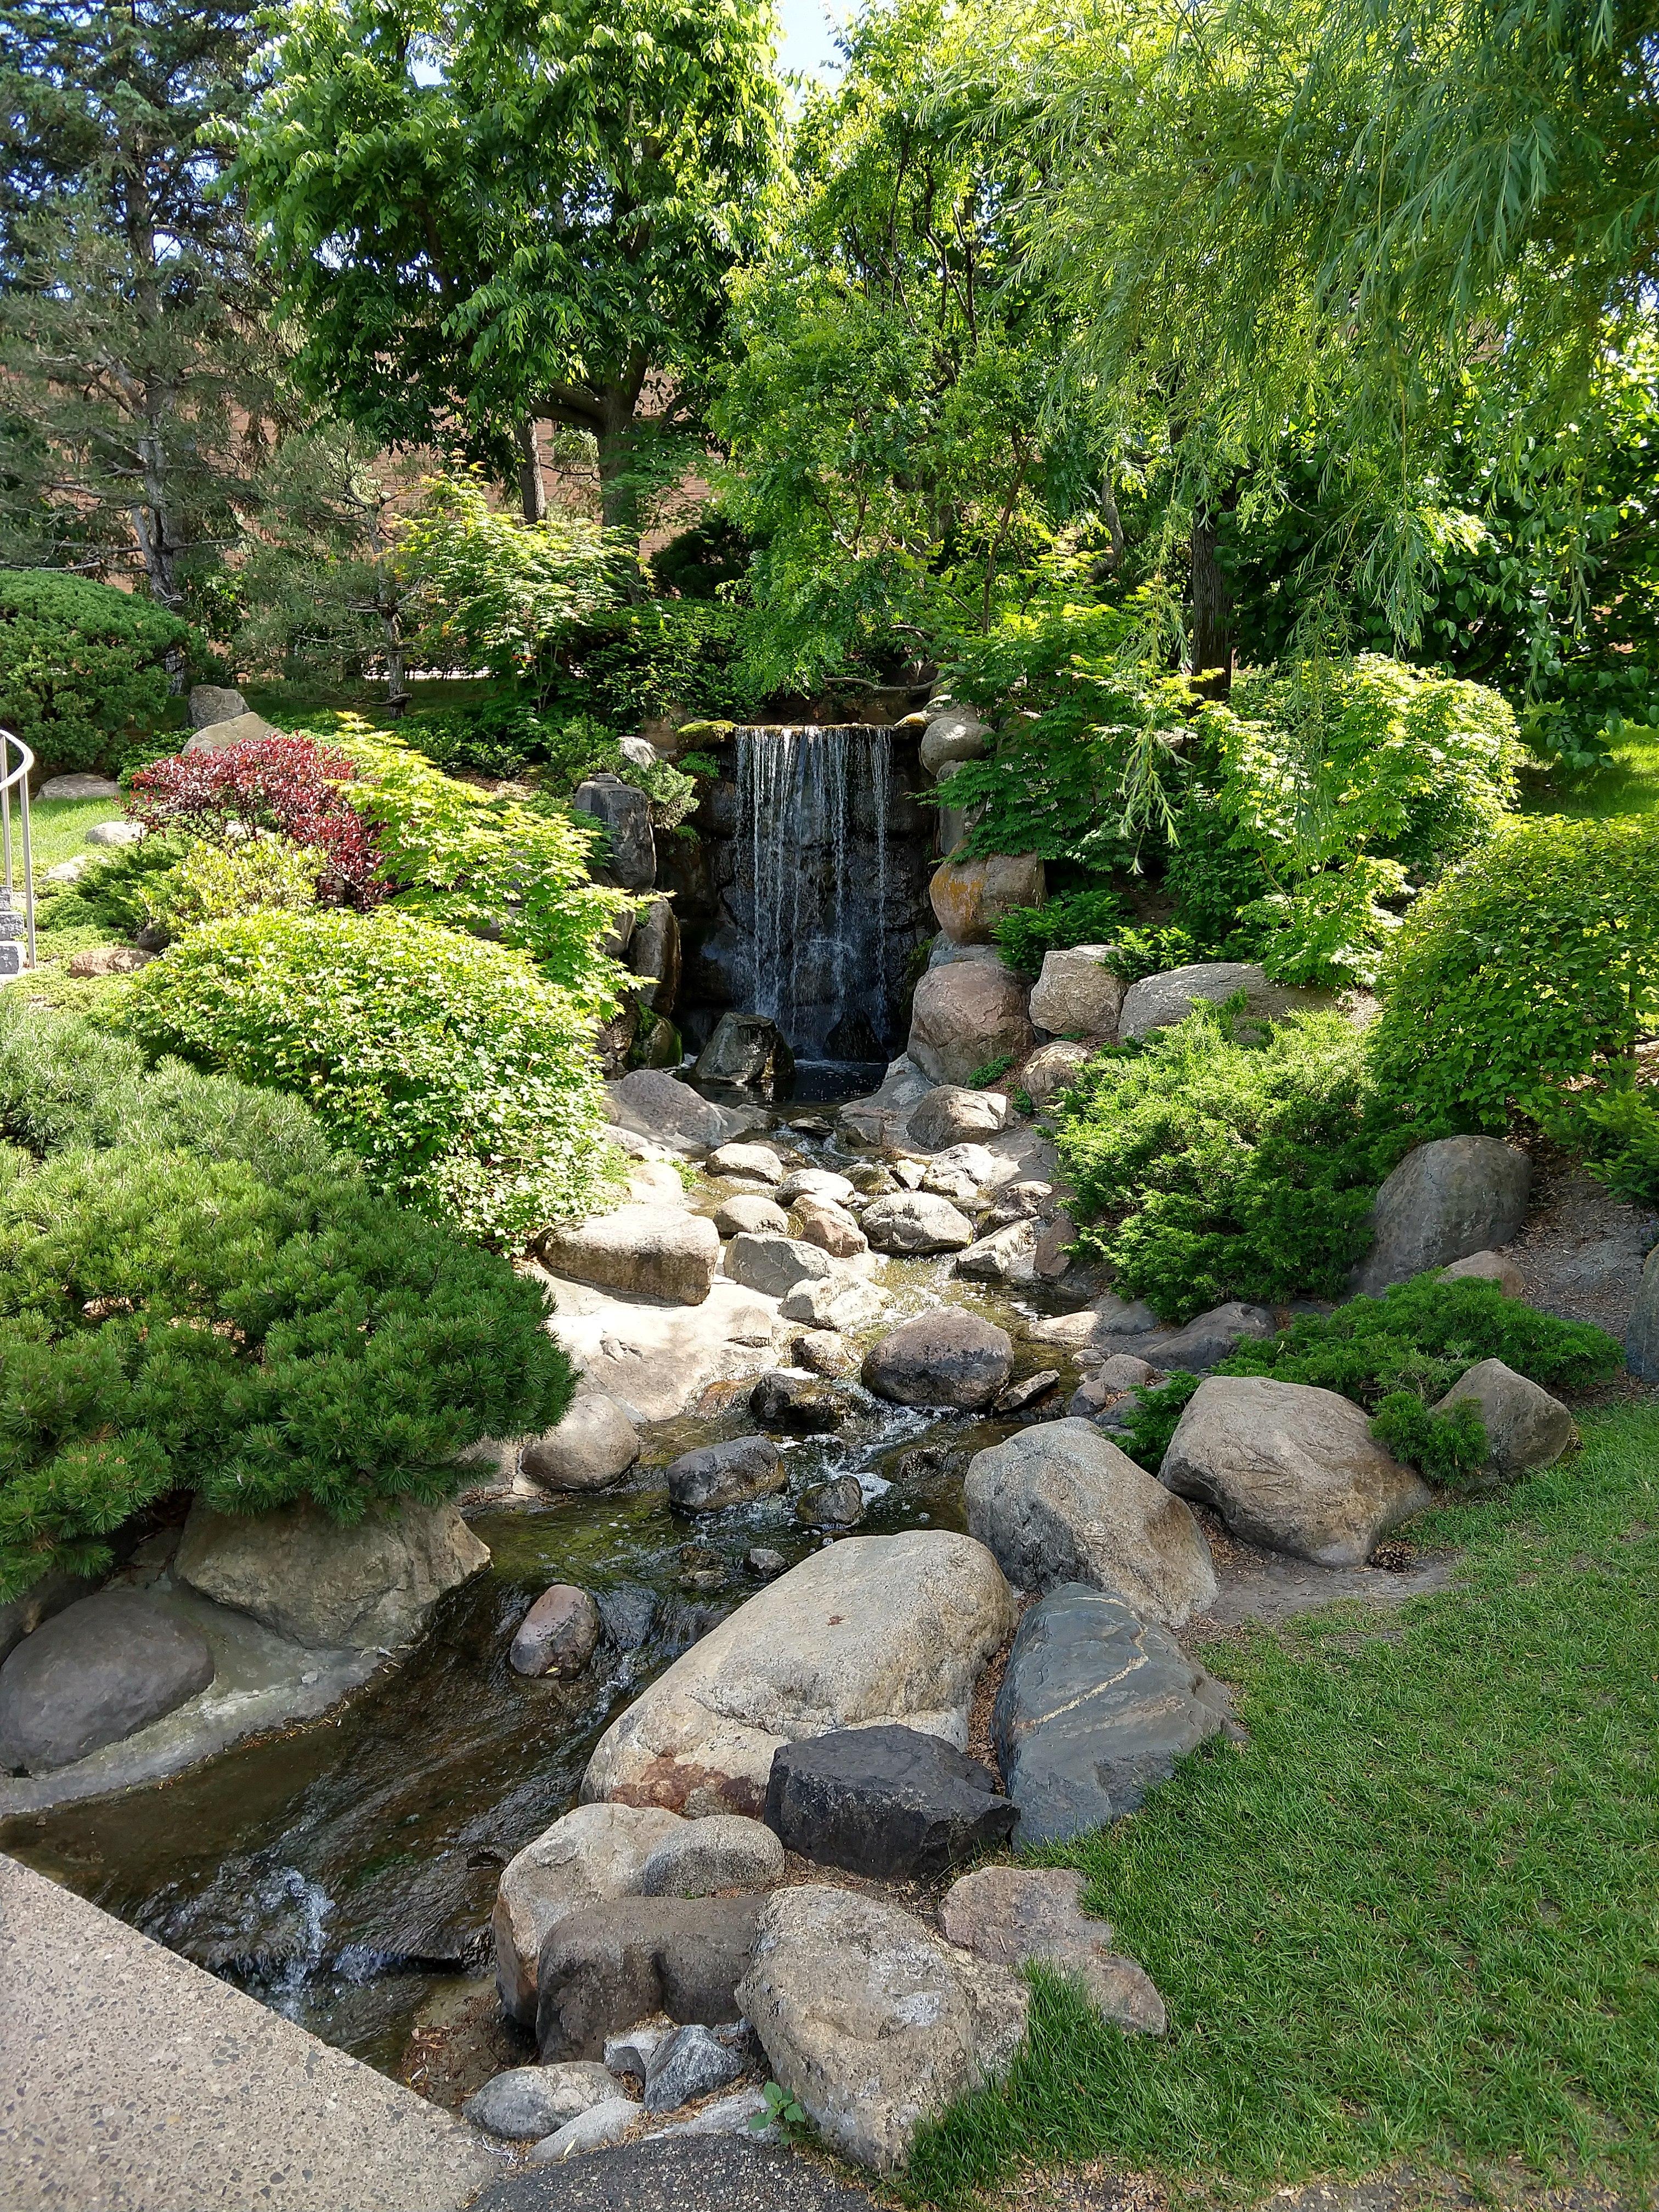 File:Normandale Community College 12 - Japanese garden.jpg